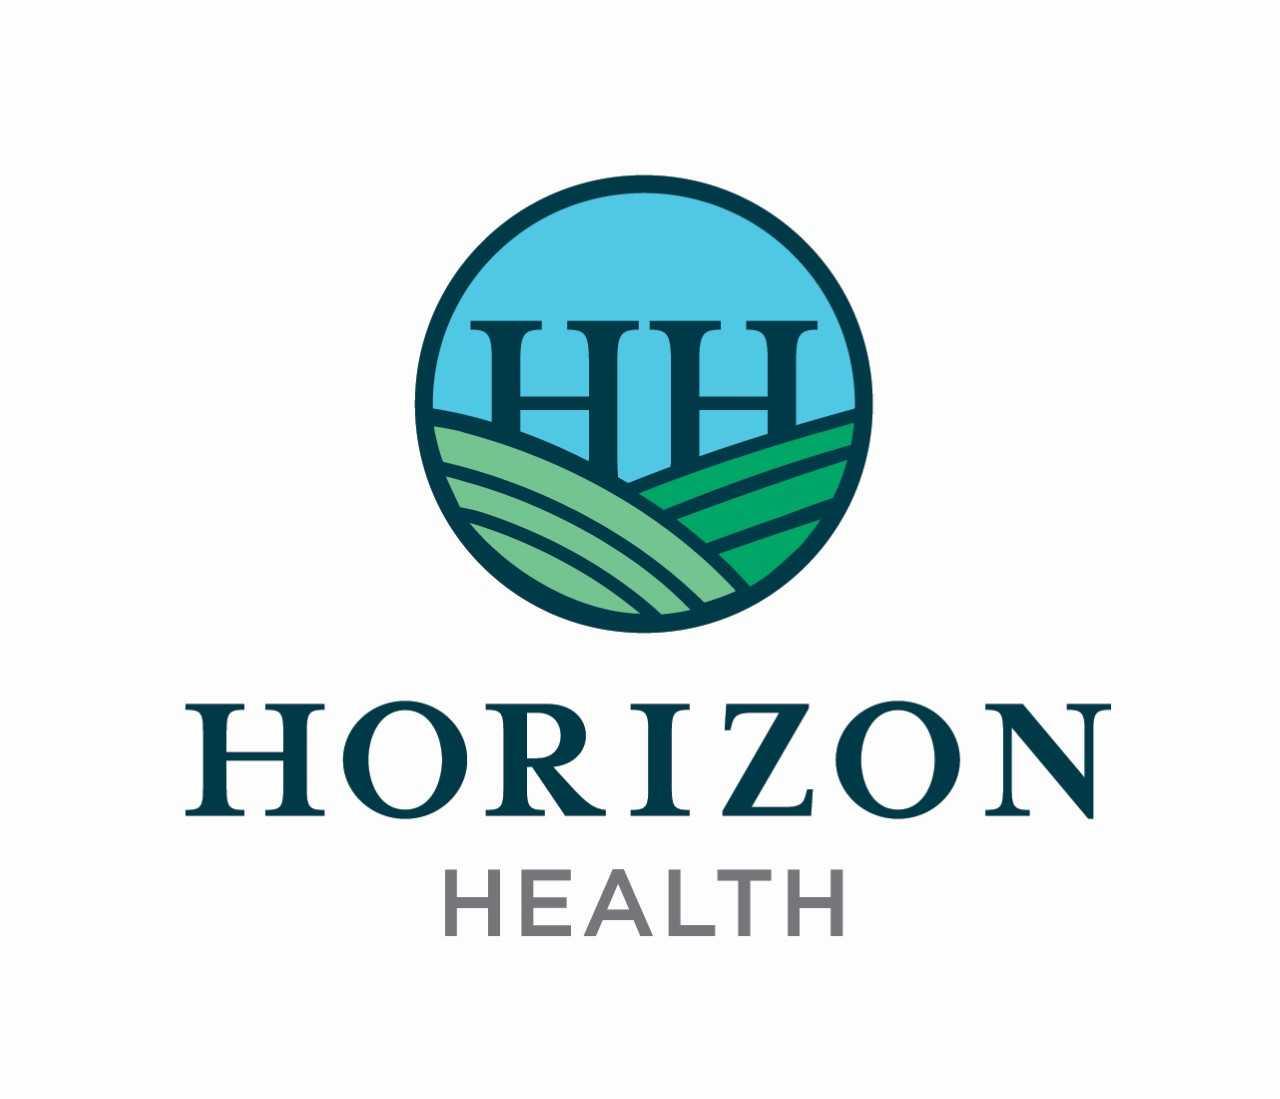 HORIZON HEALTH_1554241520847.jpg.jpg